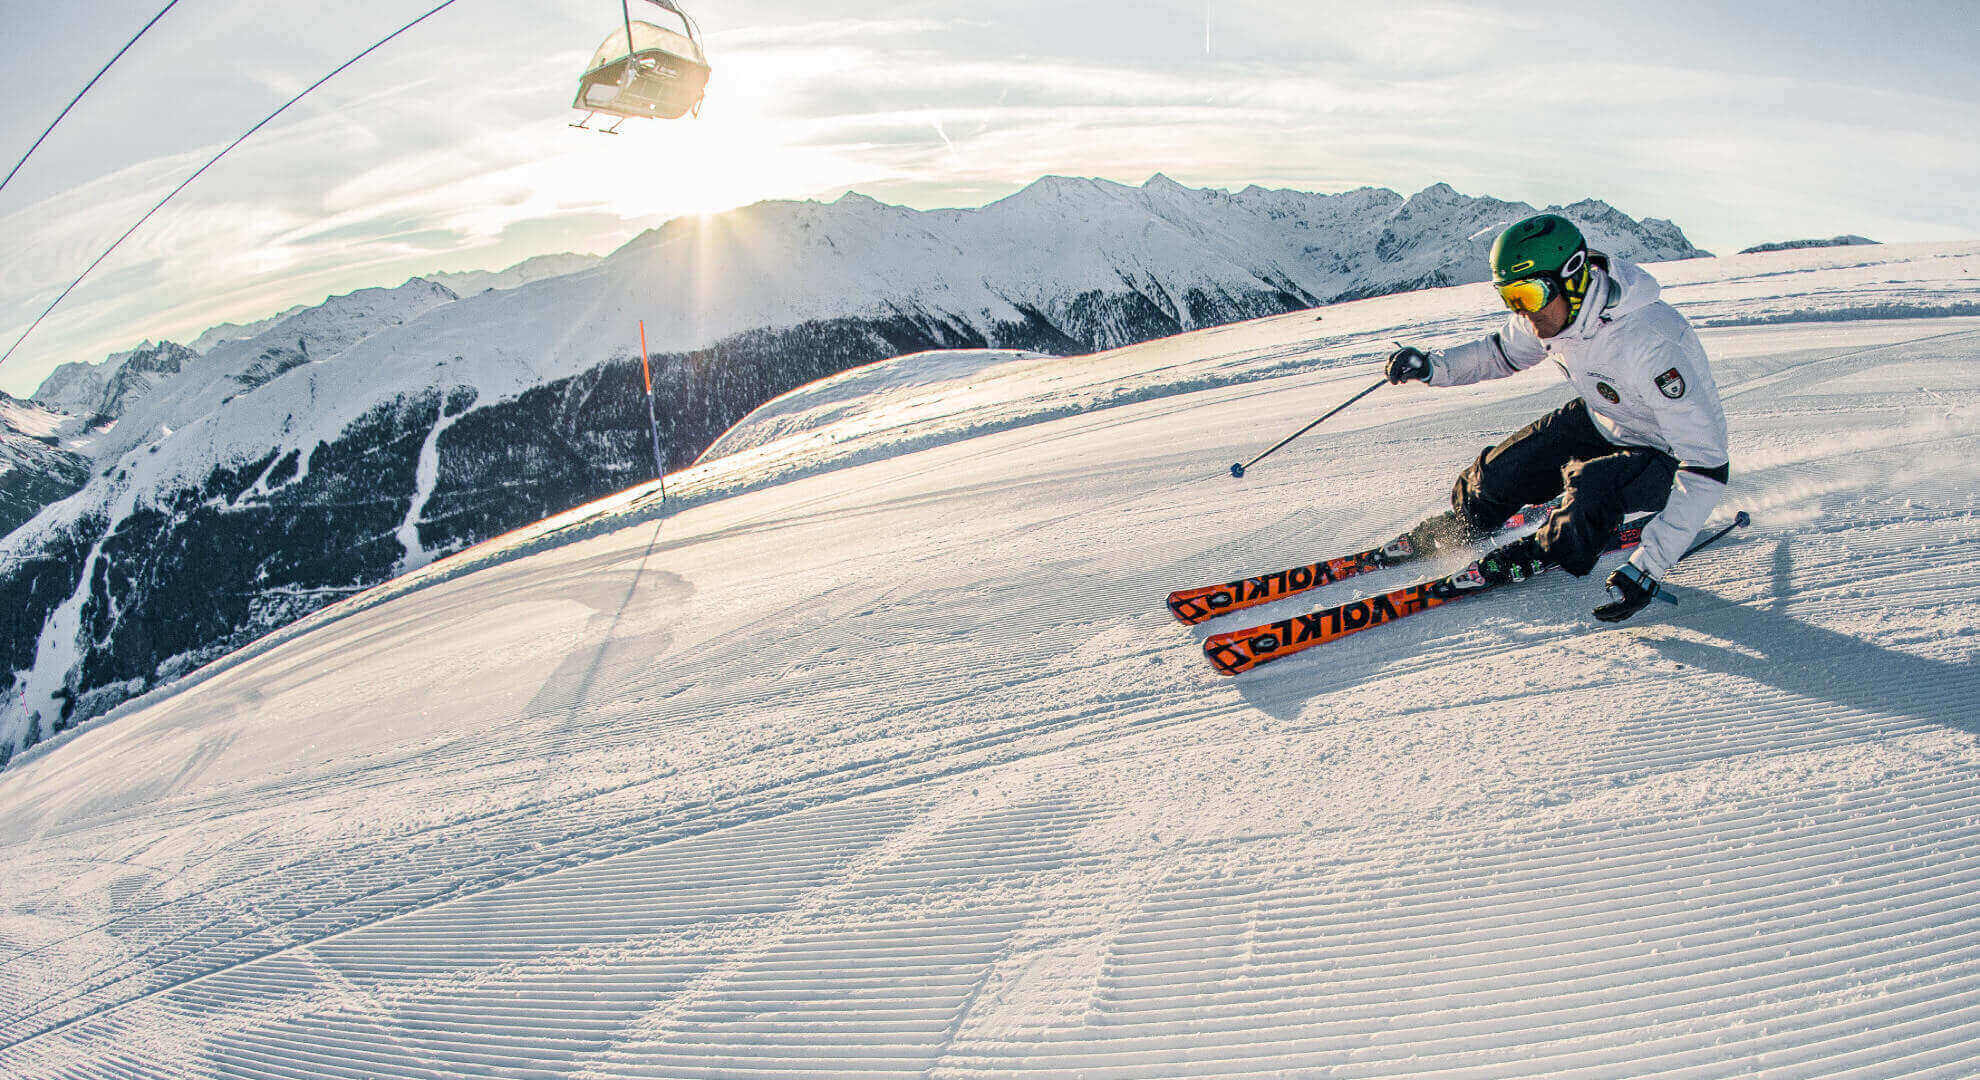 panorama ski area sitas con sciatore